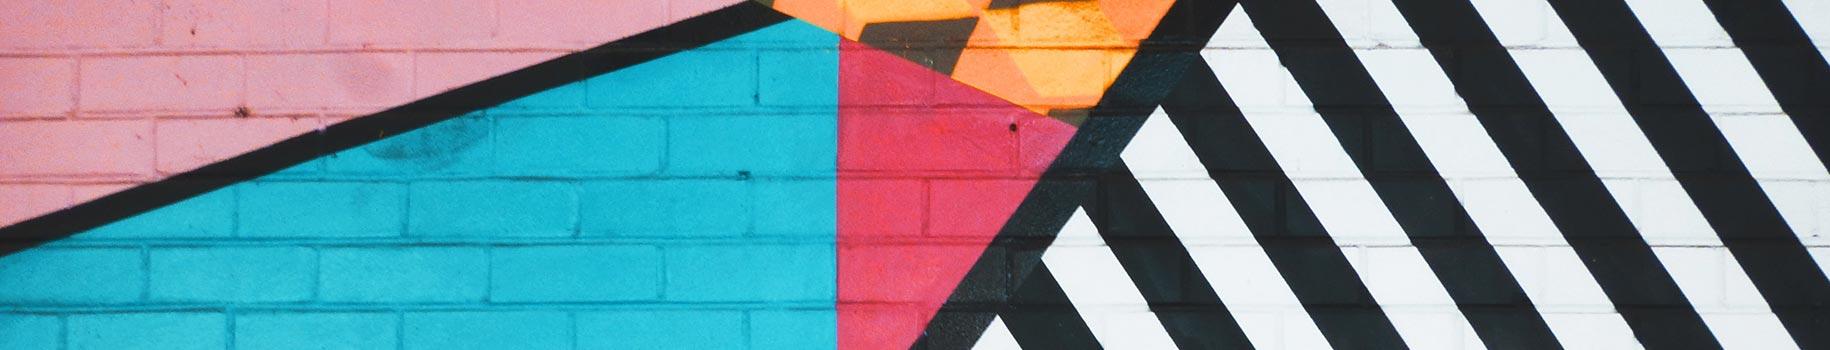 Colour consultancy at Heavins